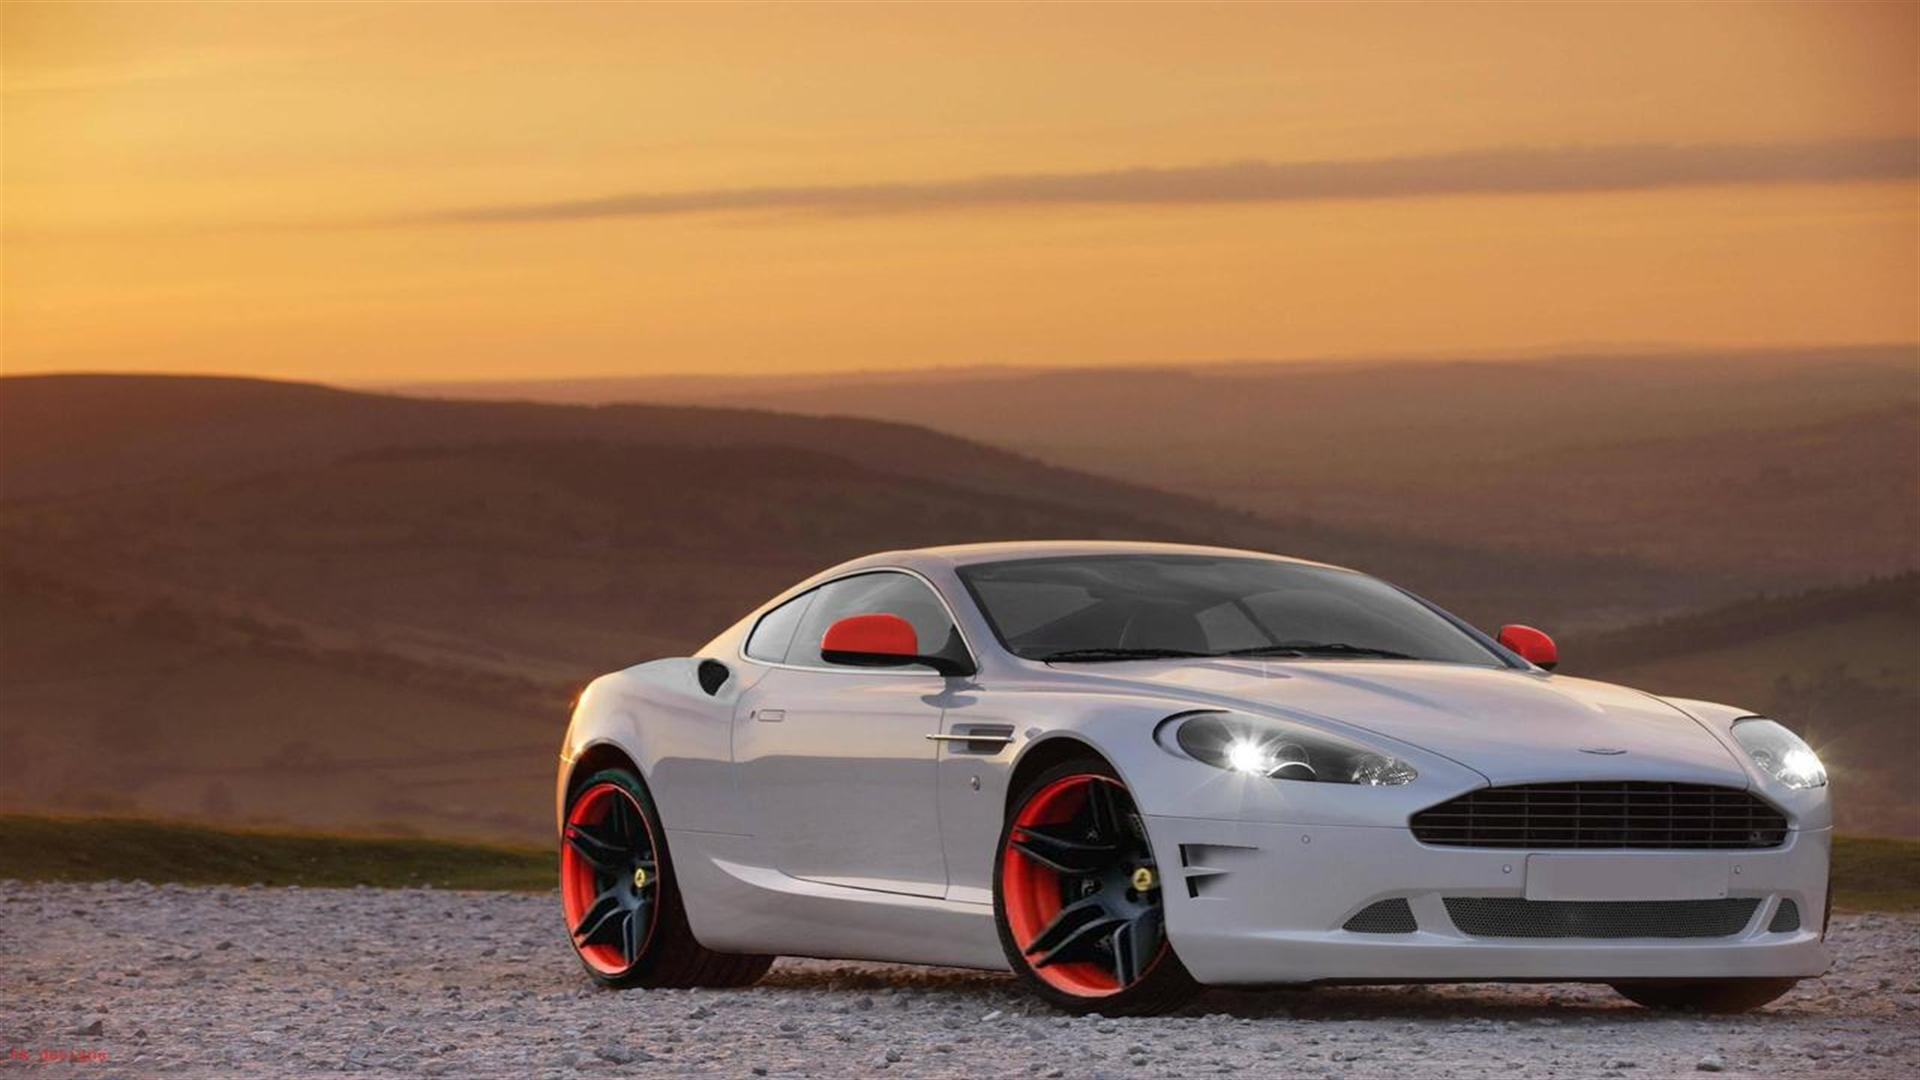 Aston Martin Wallpaper Hd